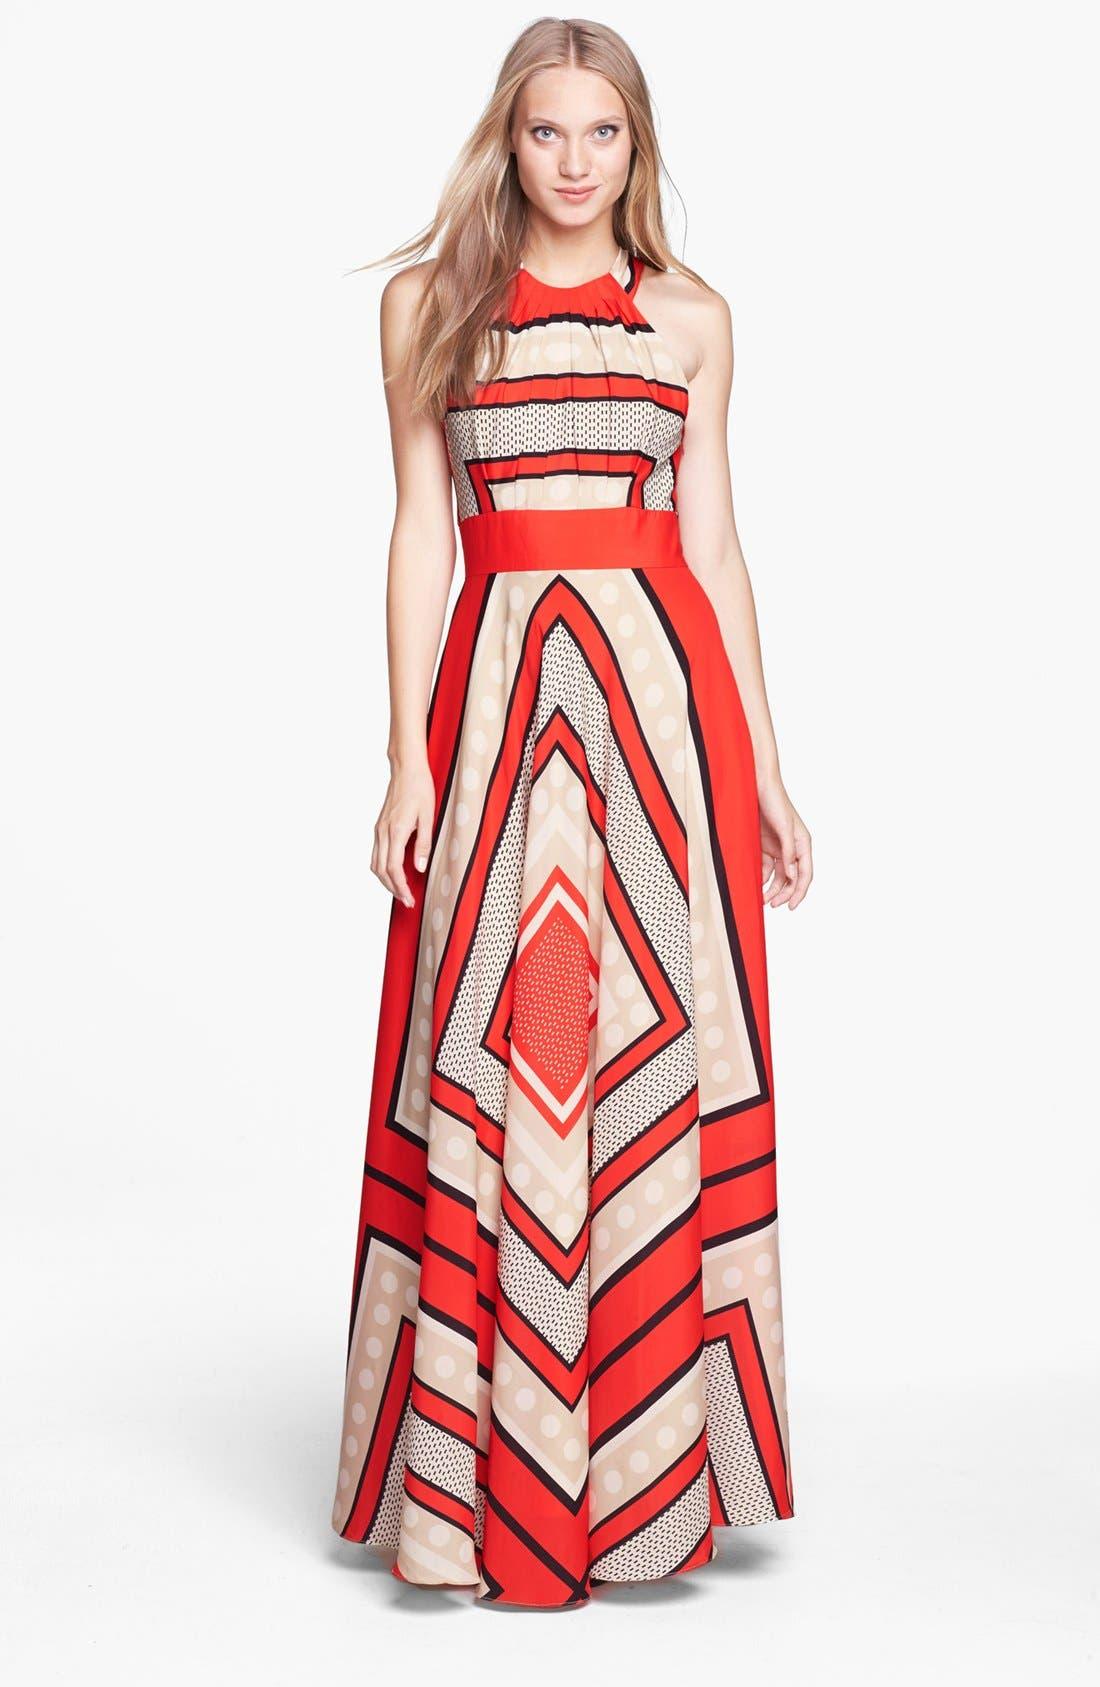 Alternate Image 1 Selected - Eliza J Scarf Print Crêpe de Chine Fit & Flare Maxi Dress (Regular & Petite)